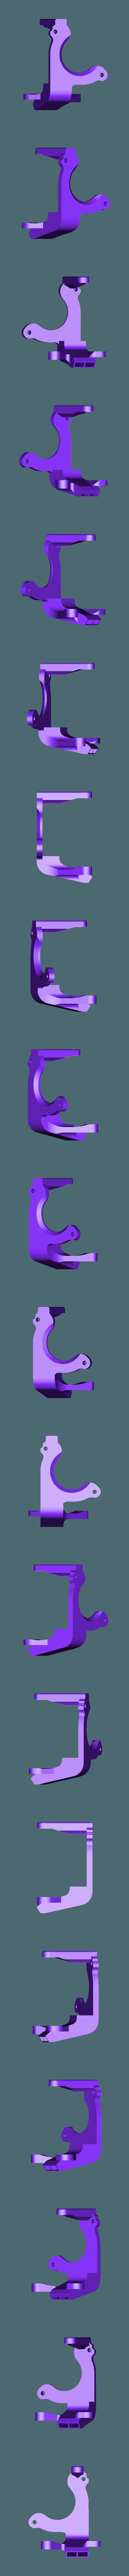 26mm_Reach-Around_Fan_Duct.stl Download free STL file Original Prusa i3 MK2 E3D Titan Aero Upgrade • Design to 3D print, Greg_The_Maker